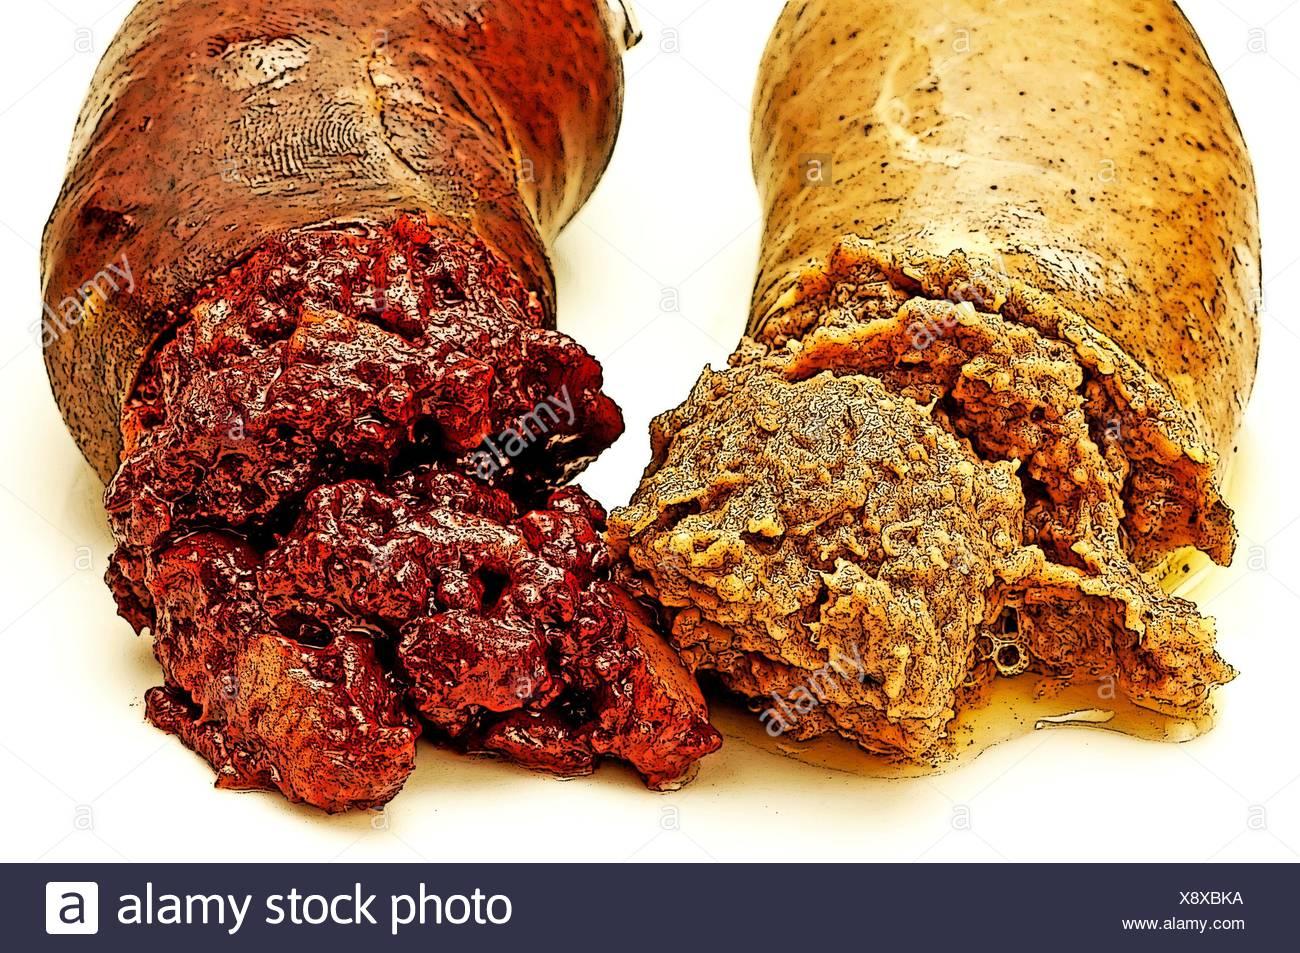 blood sausage and liver-sausage. - Stock Image